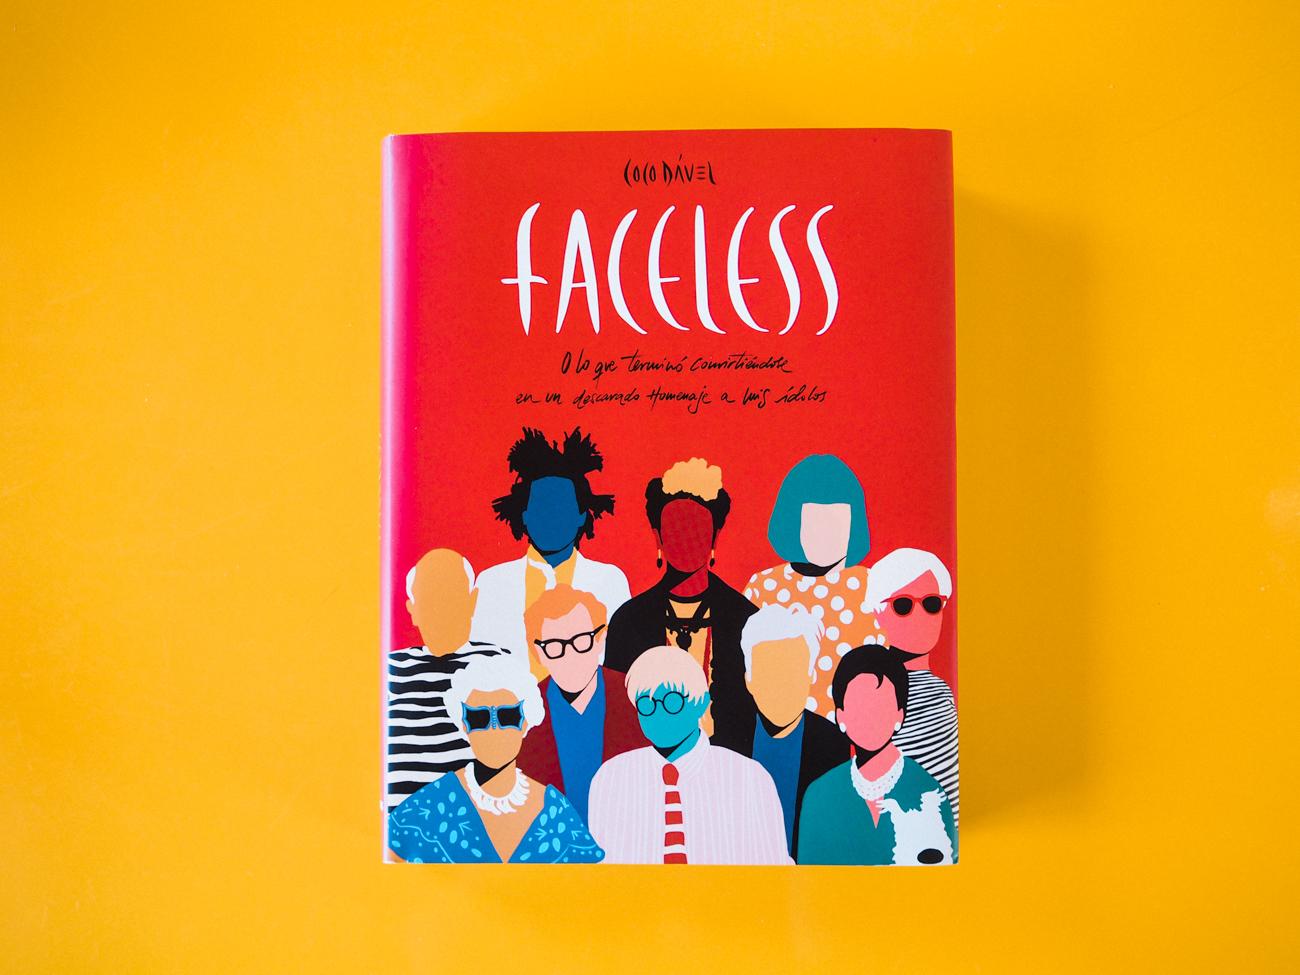 FACELESS BOOK